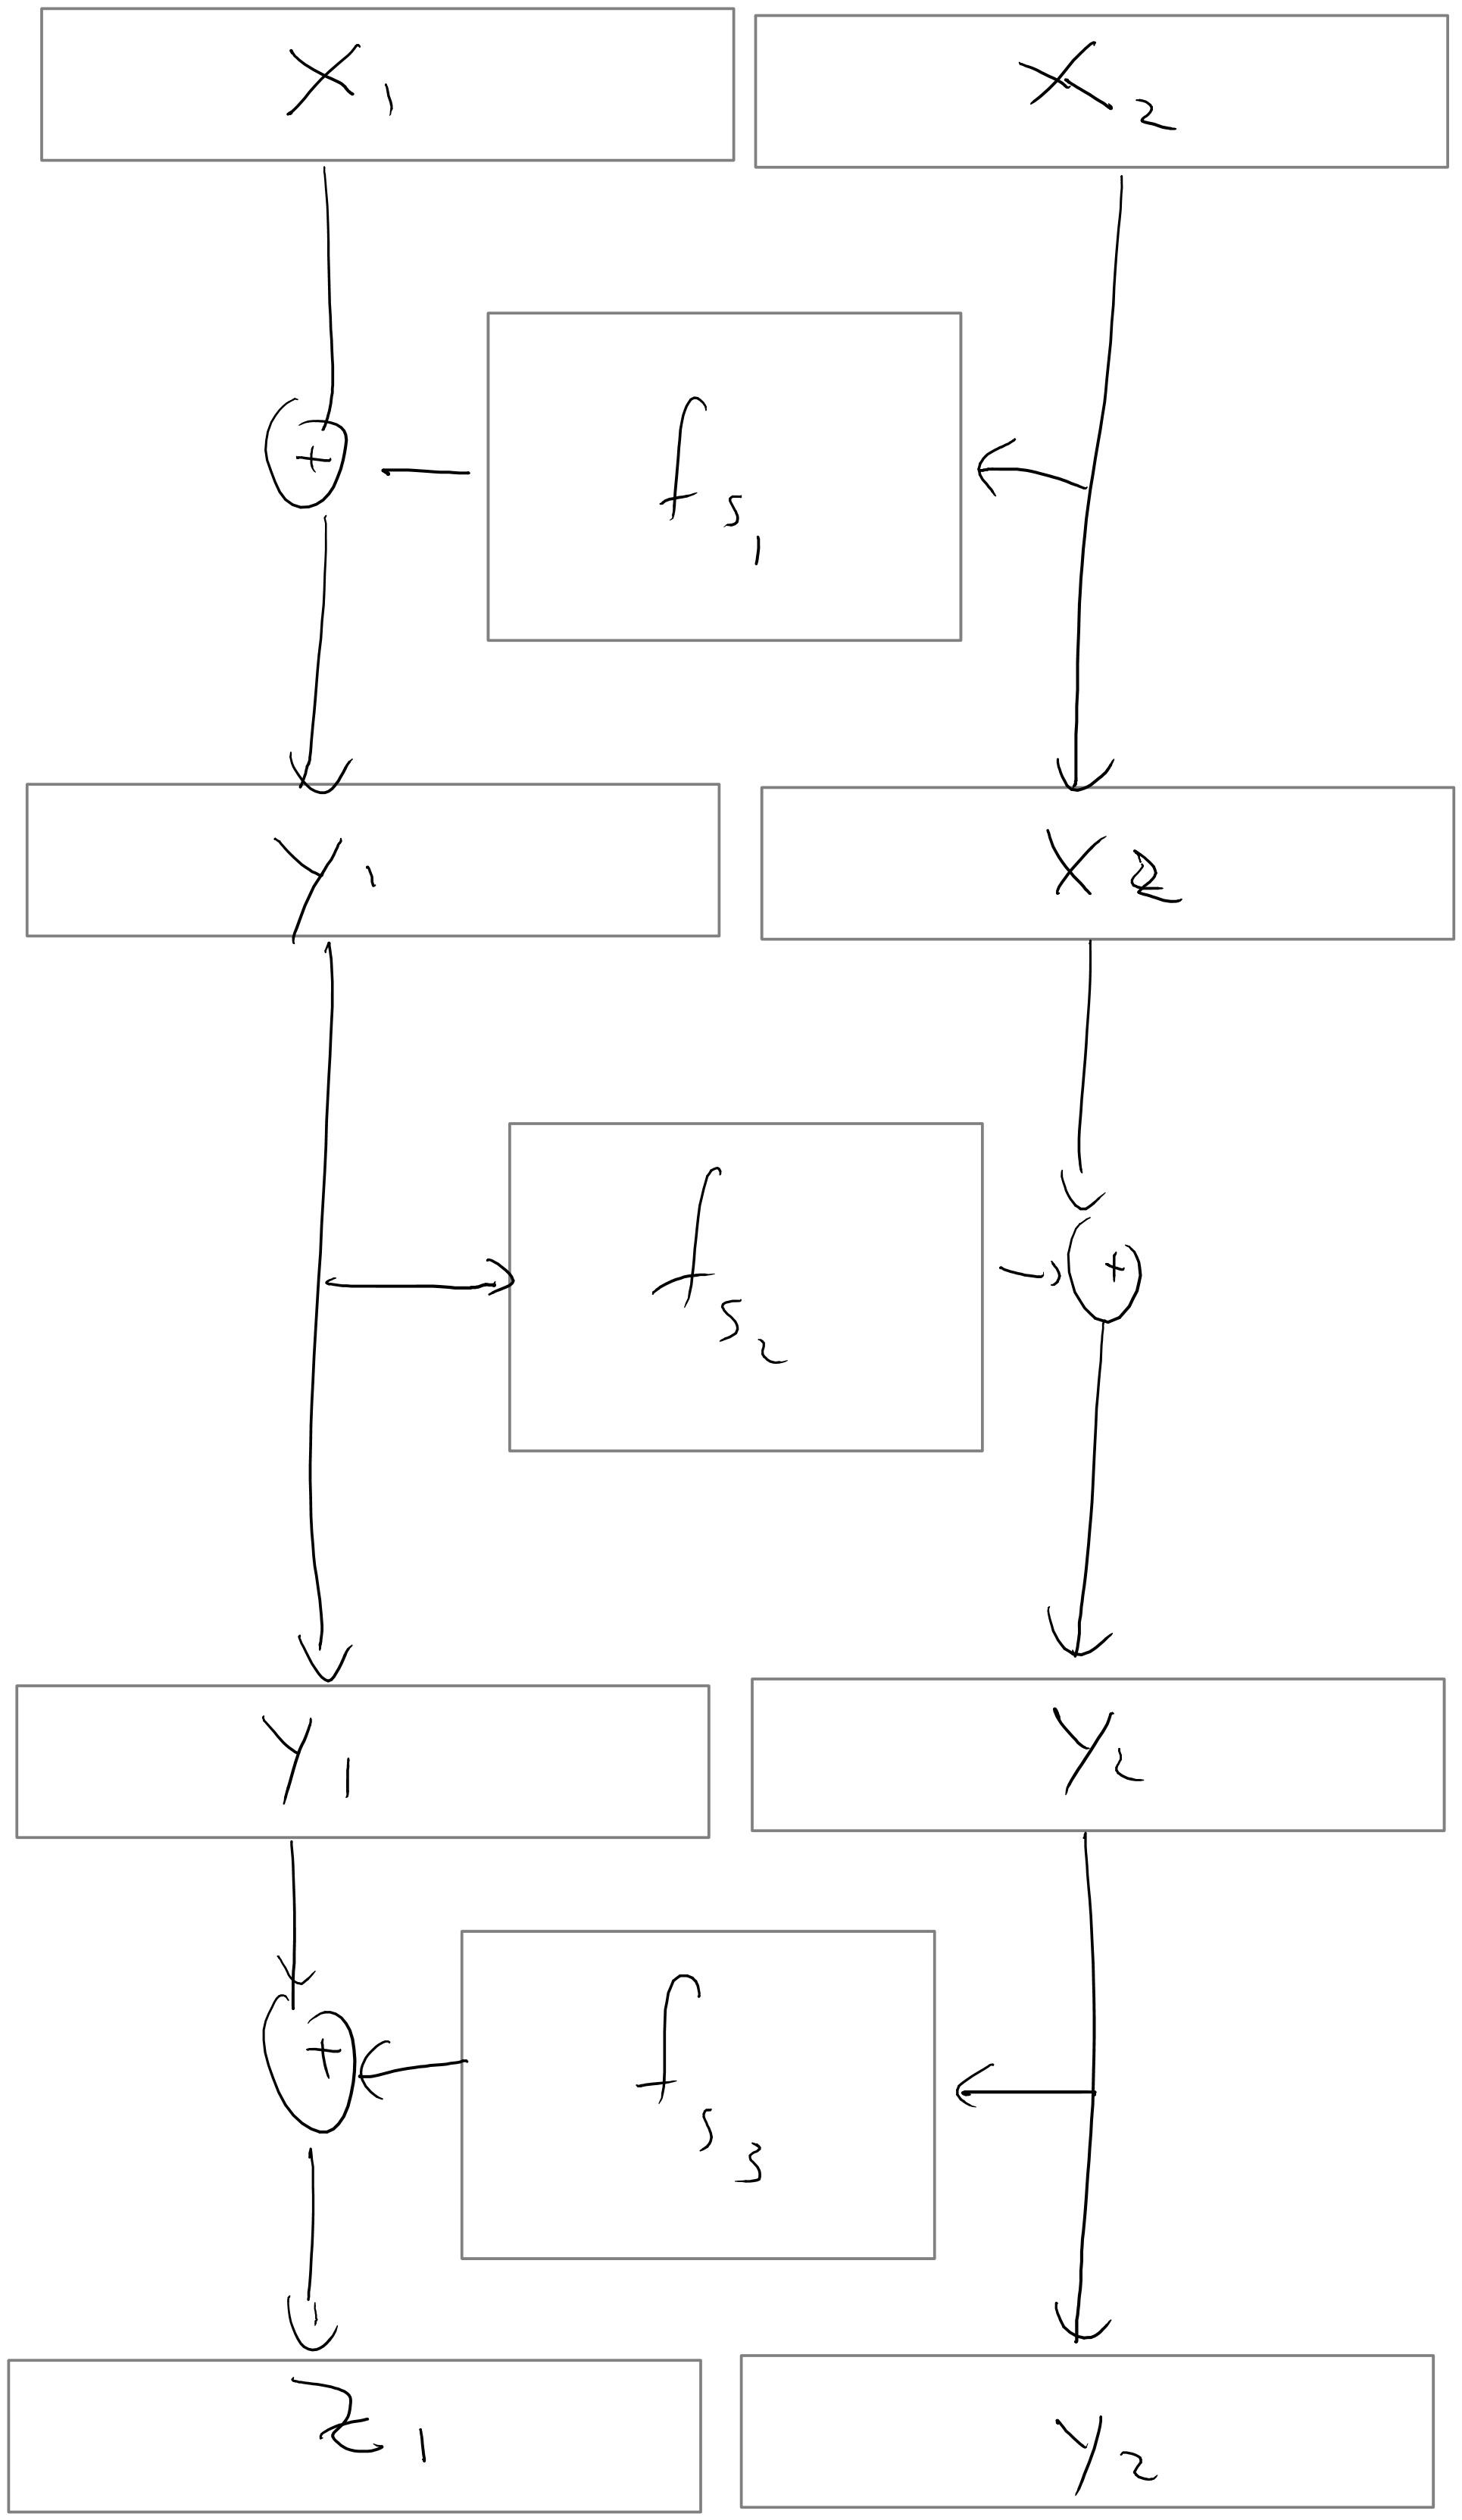 5.9: We build a PRP p on 2n bits from three PRFs f_{s_1},f_{s_2},f_{s_3} on n bits by letting p_{s_1,s_2,s_3}(x_1,x_2)=(z_1,y_2) where y_1 = x_1 \oplus f_{s_1}(x_2), y_2 = x_2 \oplus f_{s_2}(y_1) and z_1 = f_{s_3}(y_2) \oplus y_1.